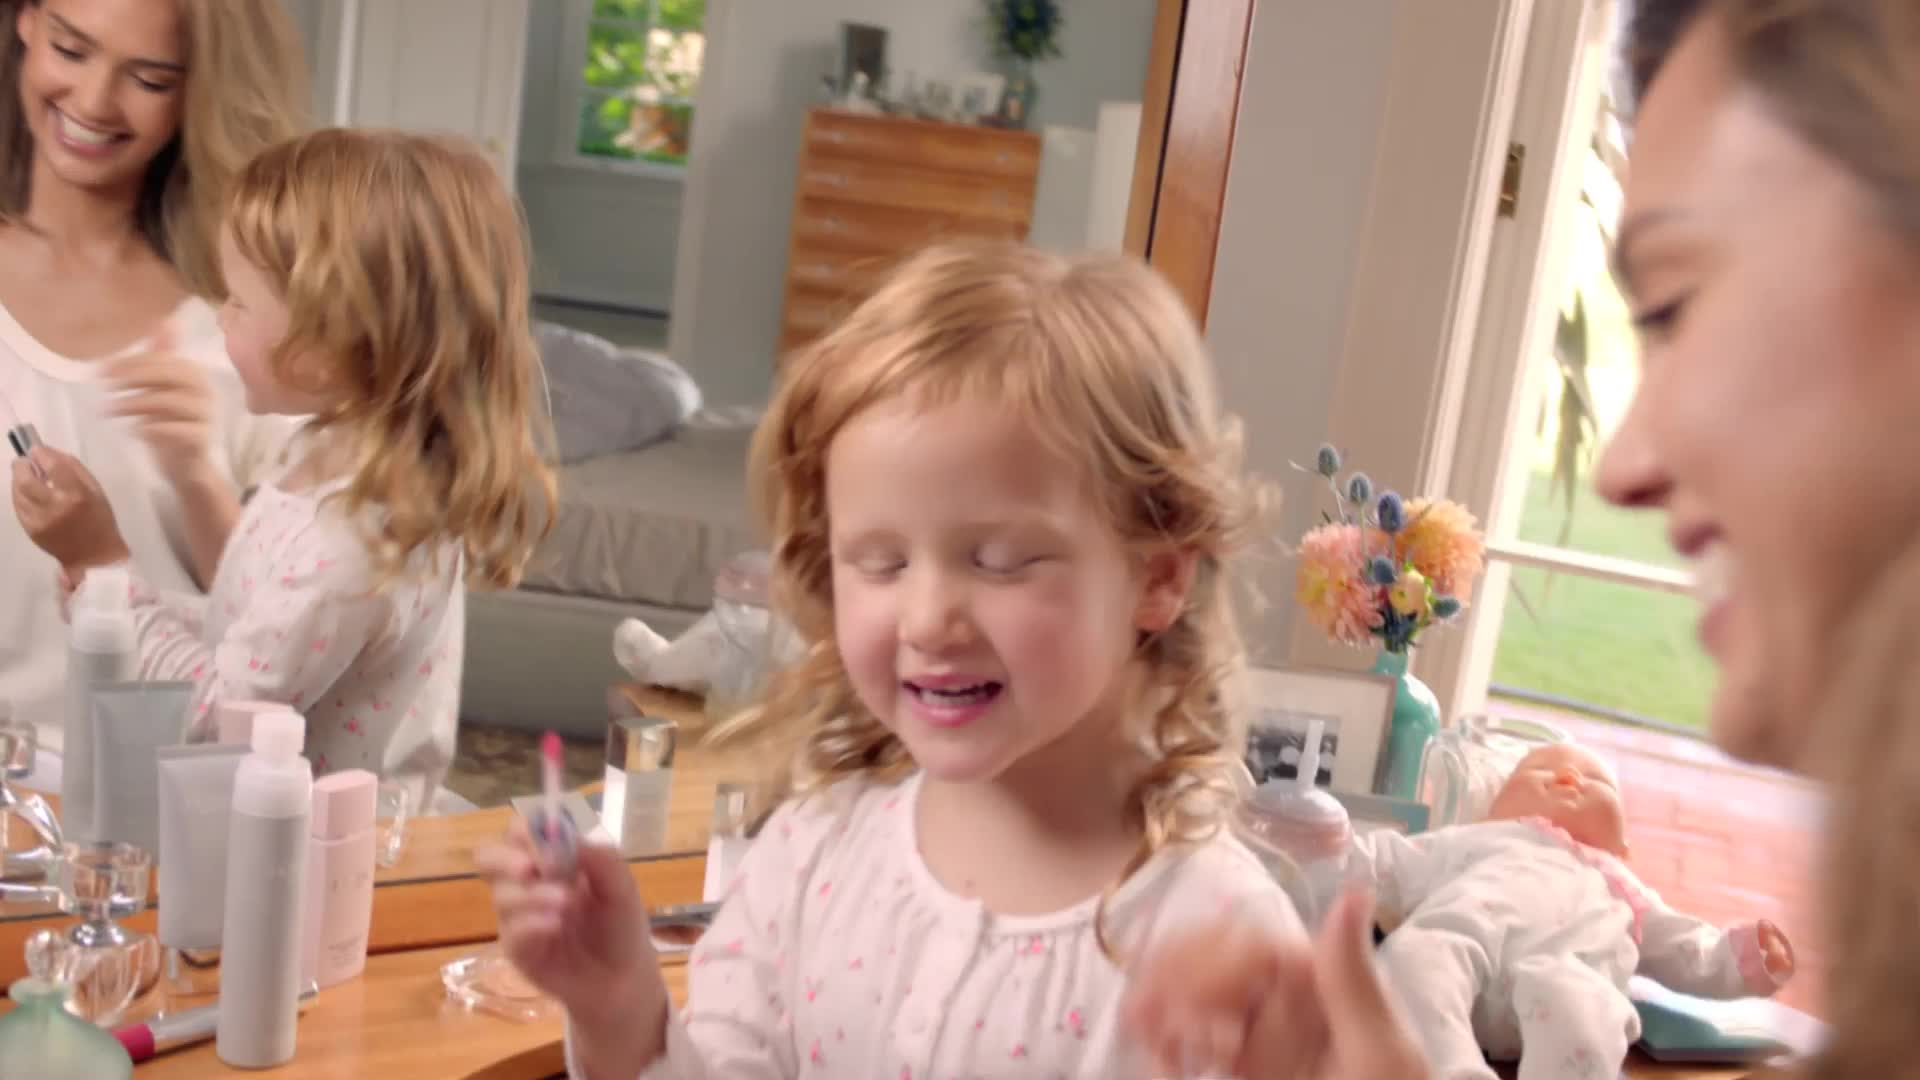 Honest Beauty #LetsBeHonest Brand Campaign at HonestBeauty.com